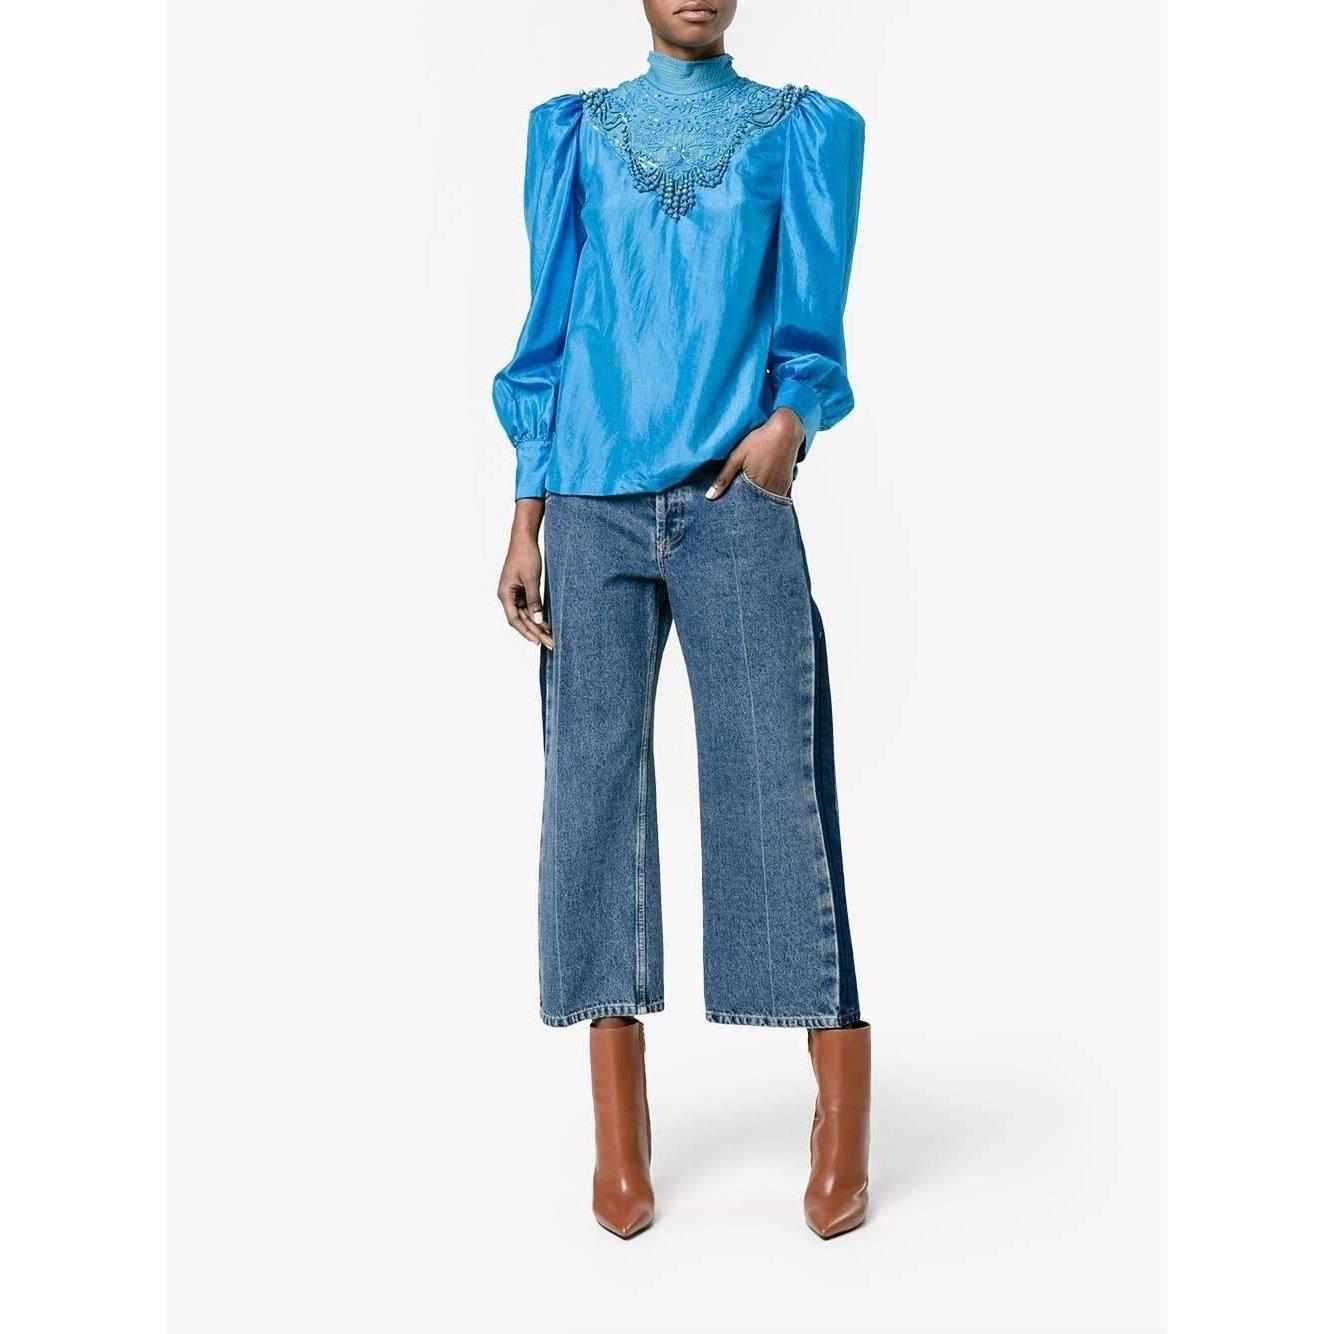 f3ea2ce48883f Dries Van Noten - Blue - Coxy Embellished Blouse - Women - Silk - 34 -.  View fullscreen